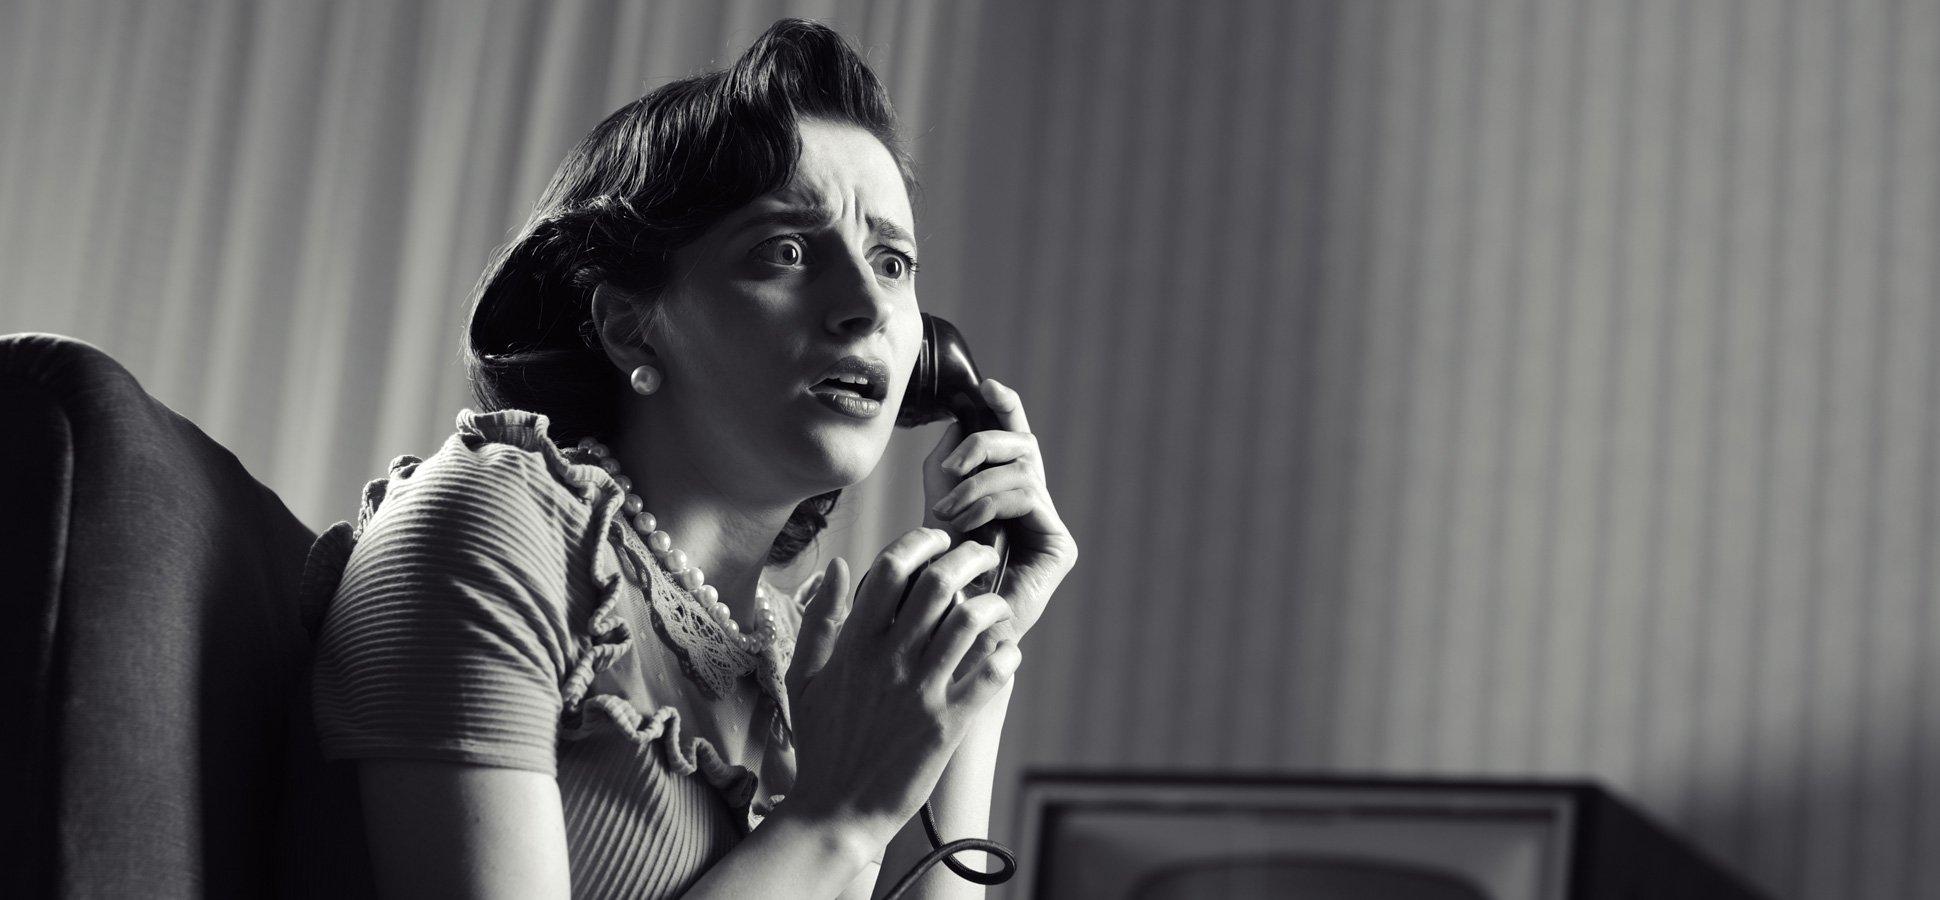 phone-anxiety-drama-retro_1940x900_33730